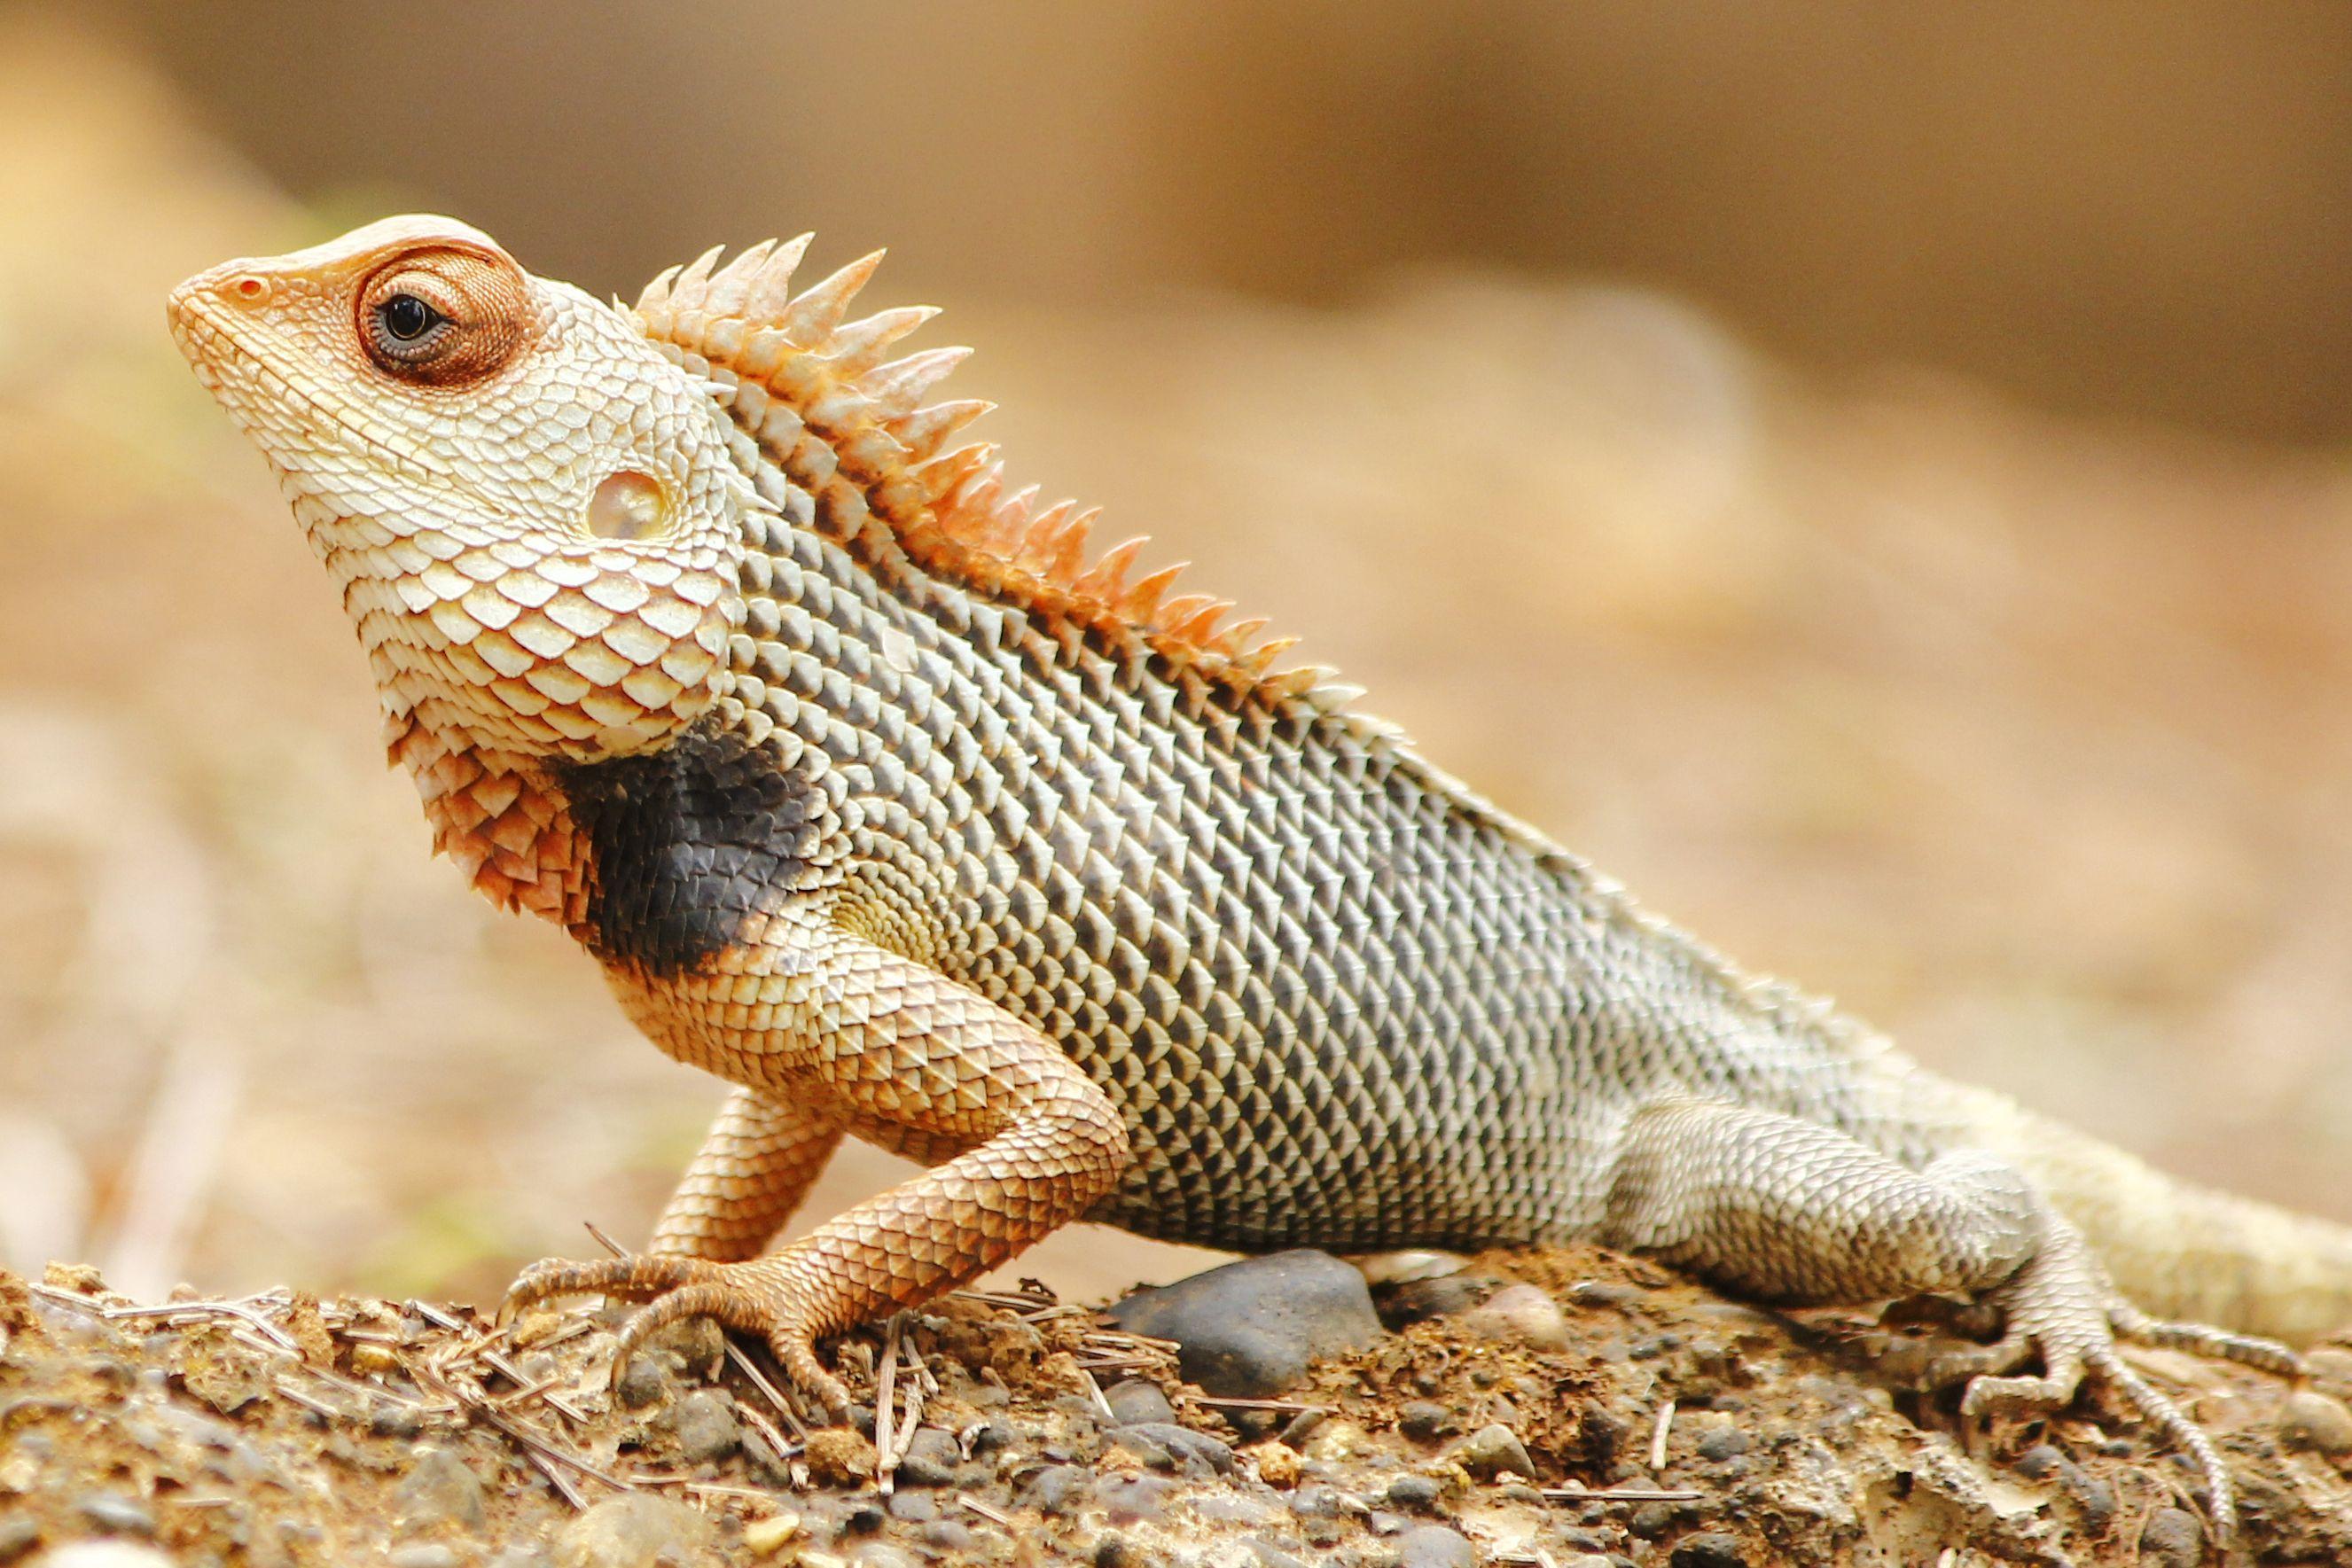 oriental garden lizard | animals, reptiles, old things